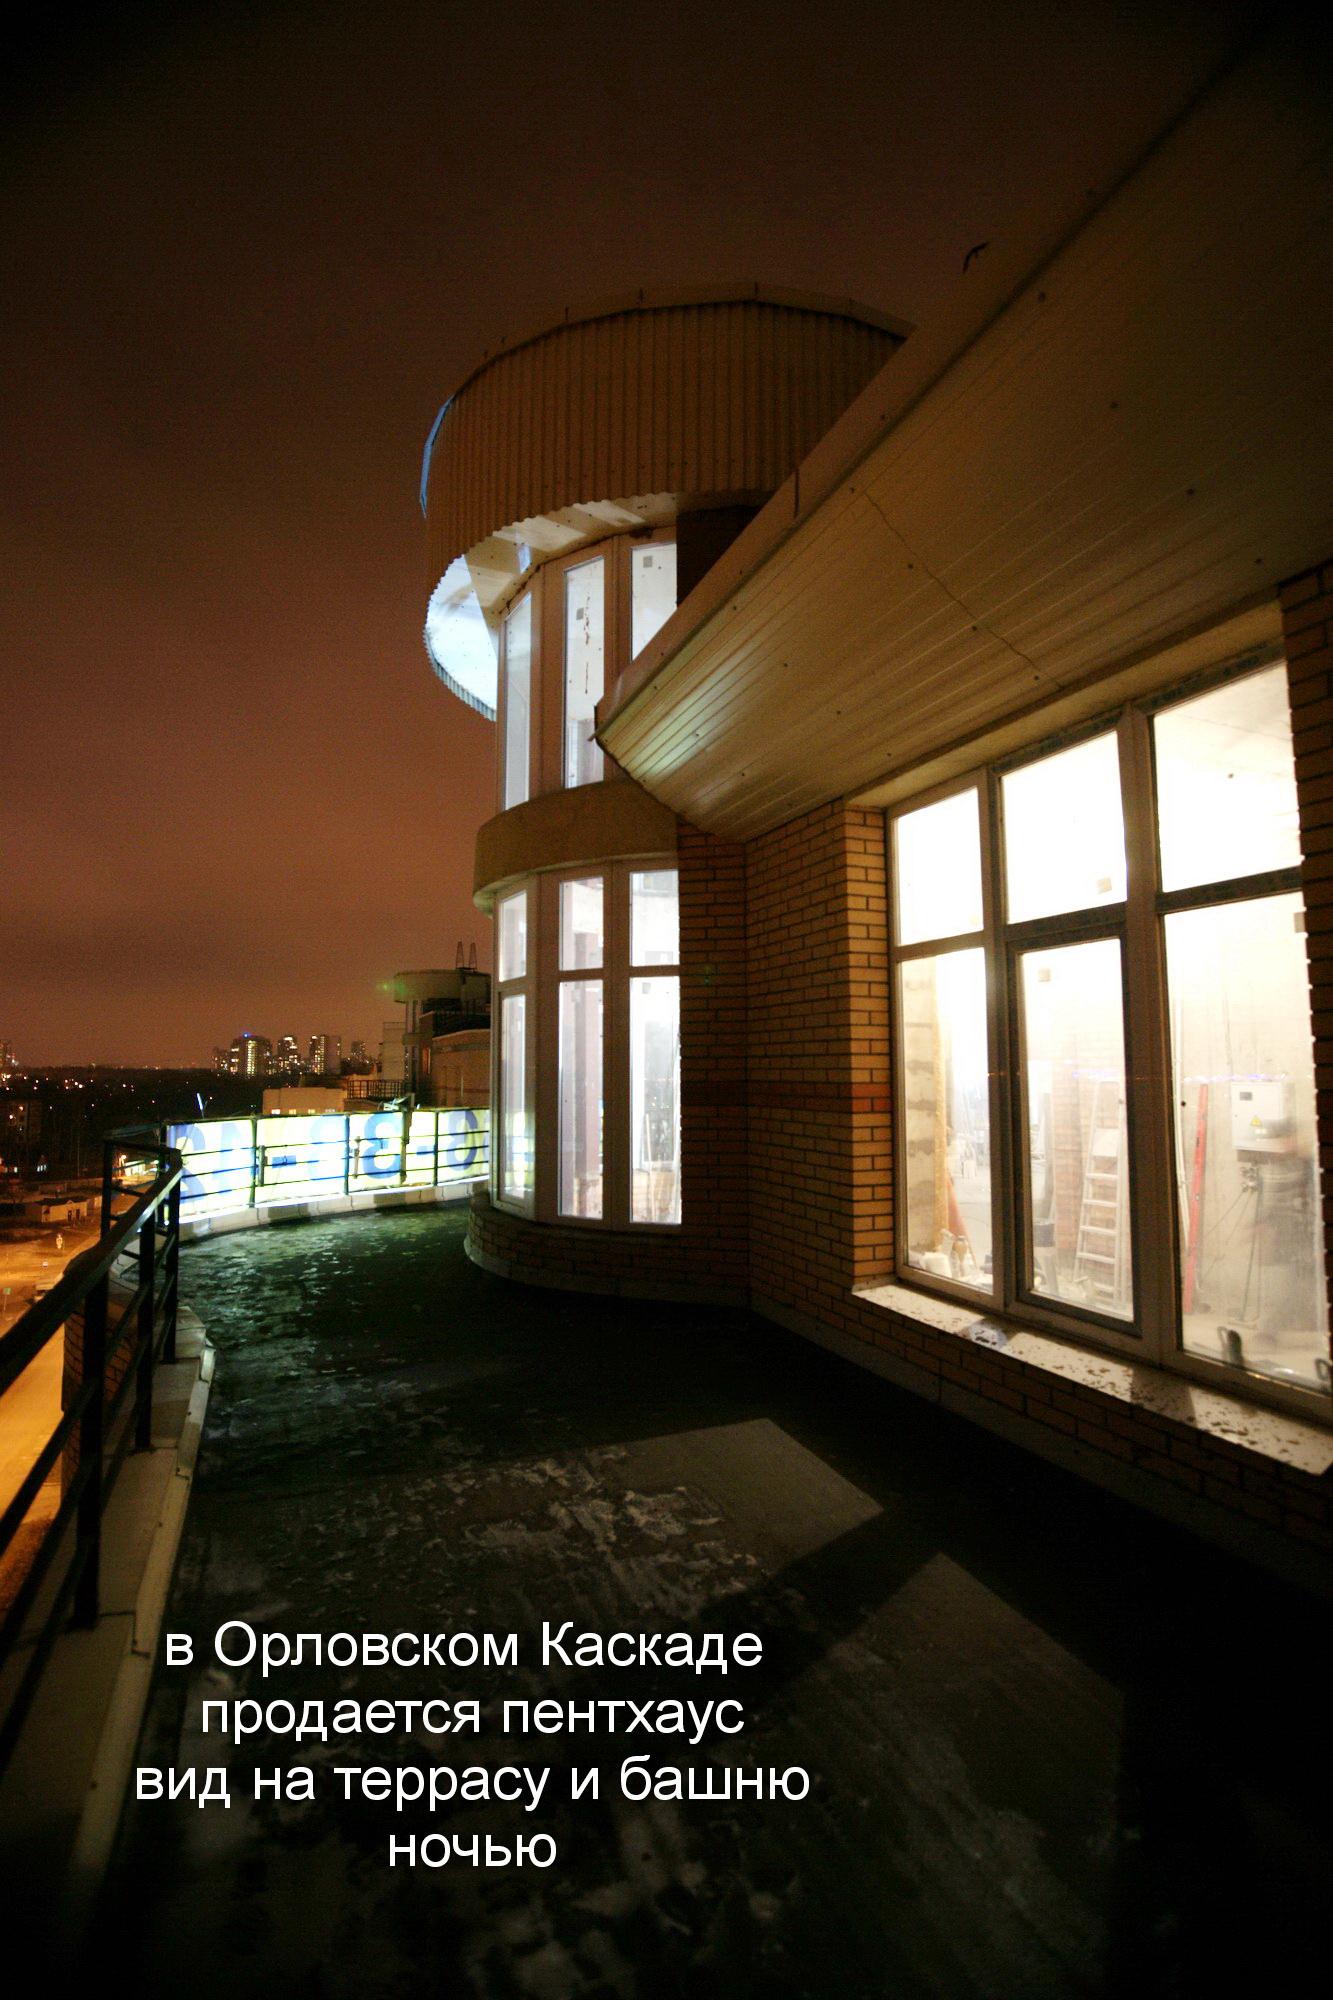 DSC03523 квартира пентхаус в Санкт-Петербурге.JPG